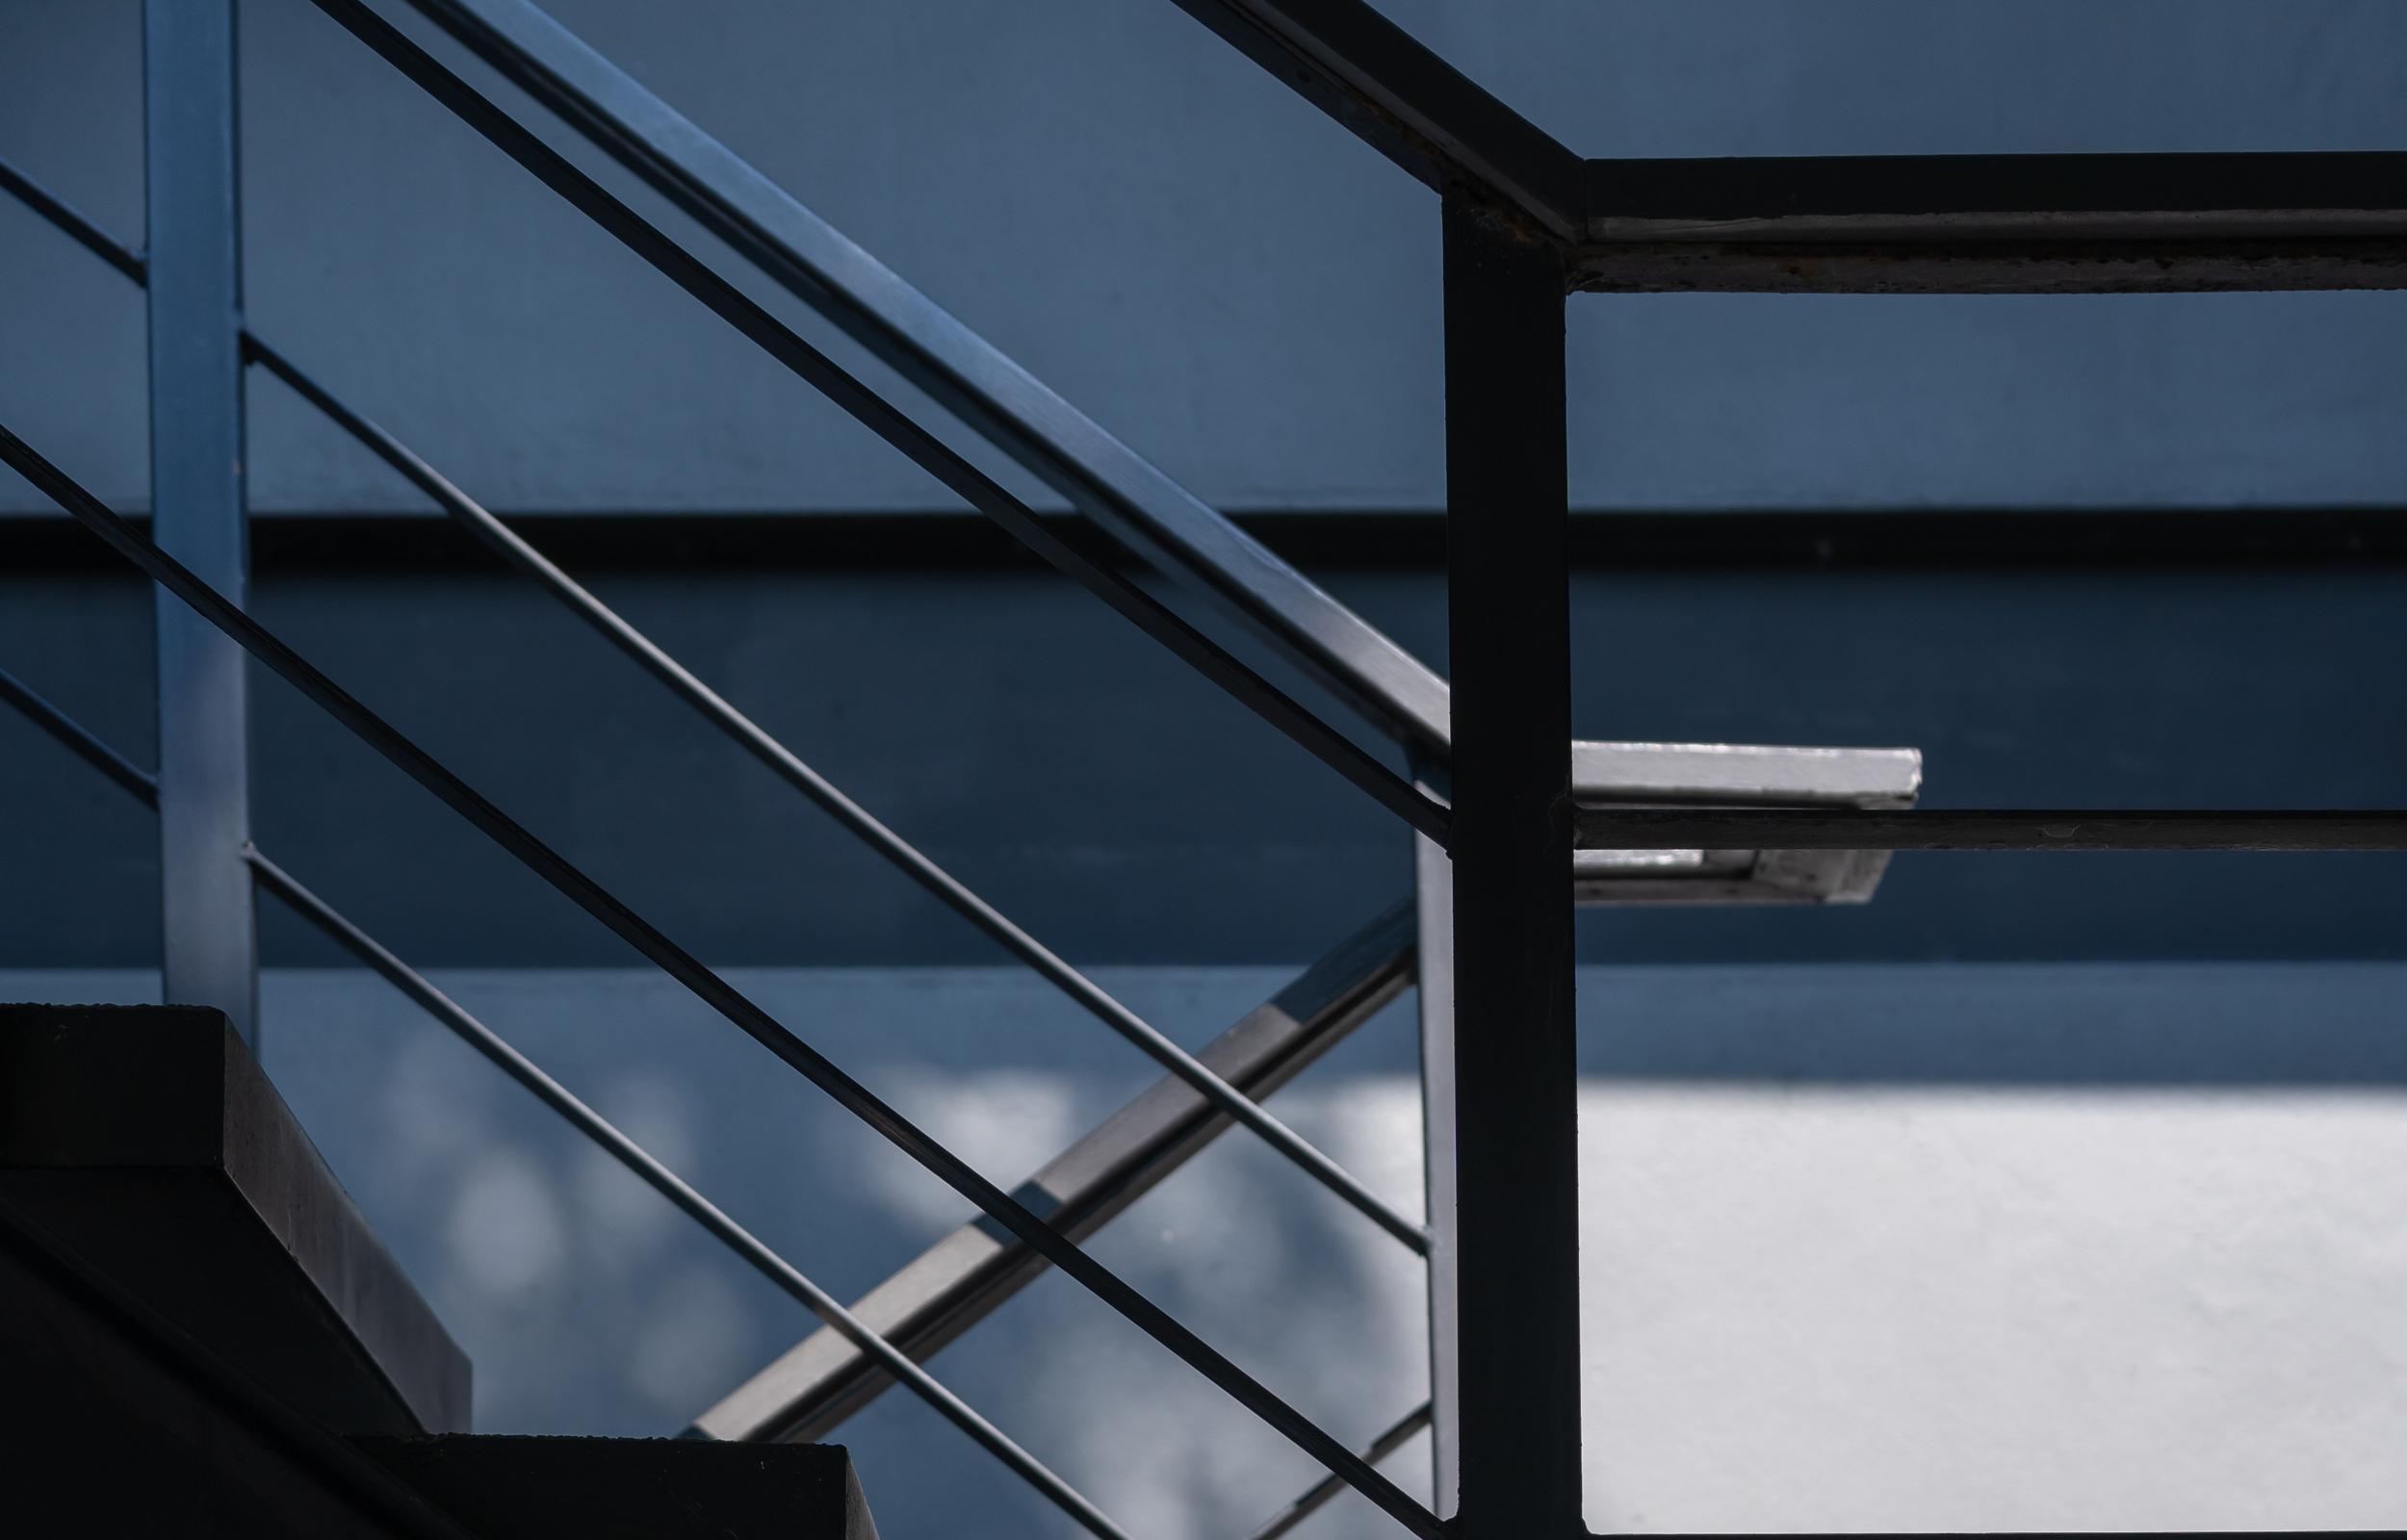 Stairway with black metallic banister modern building architectu